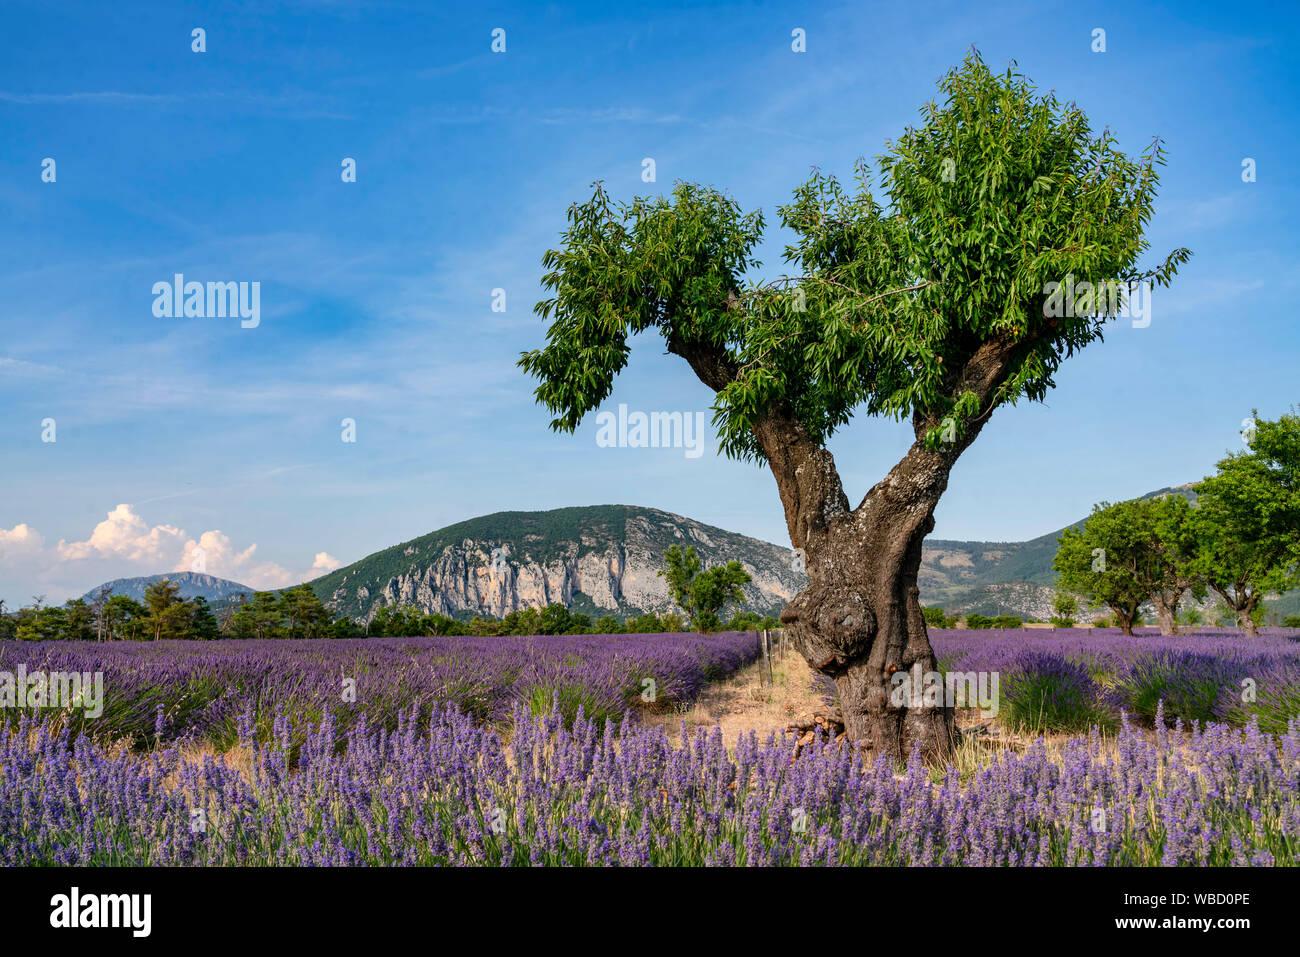 Campo de lavanda con árbol, Lavandula angustifolia, la Meseta de Valensole, Francia Provence-Alpes-Côte d'Azur, Francia Foto de stock